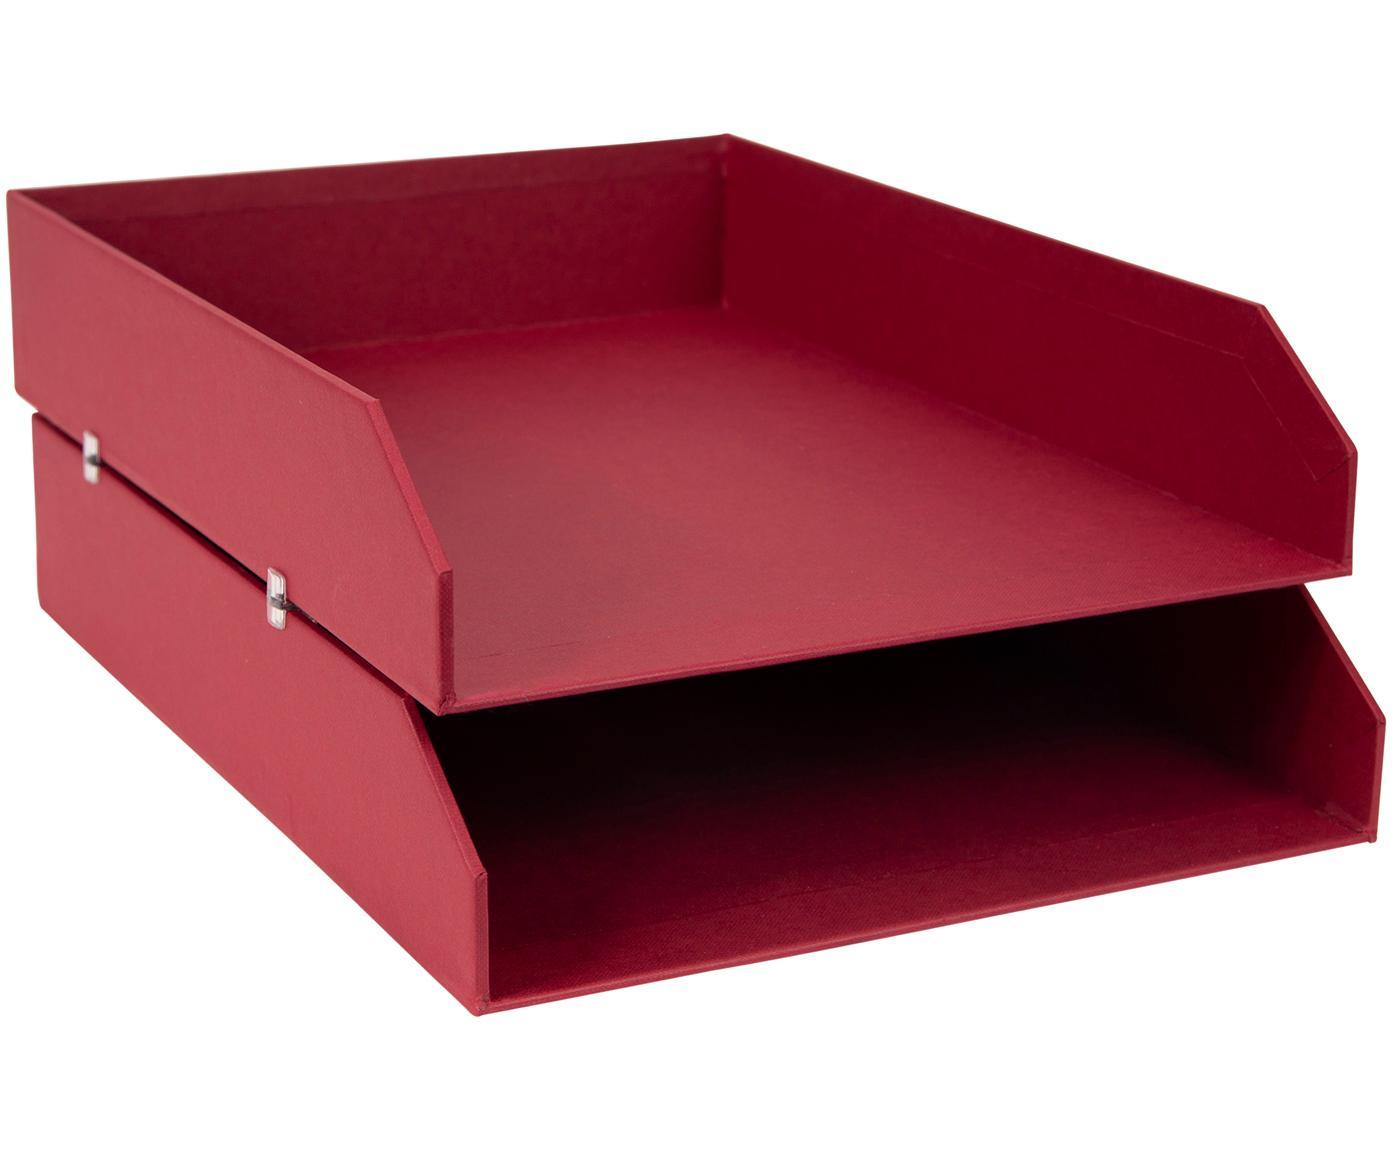 Bandejas para documentos Hakan, 2uds., Cartón laminado, Rojo oscuro, An 23 x F 31 cm